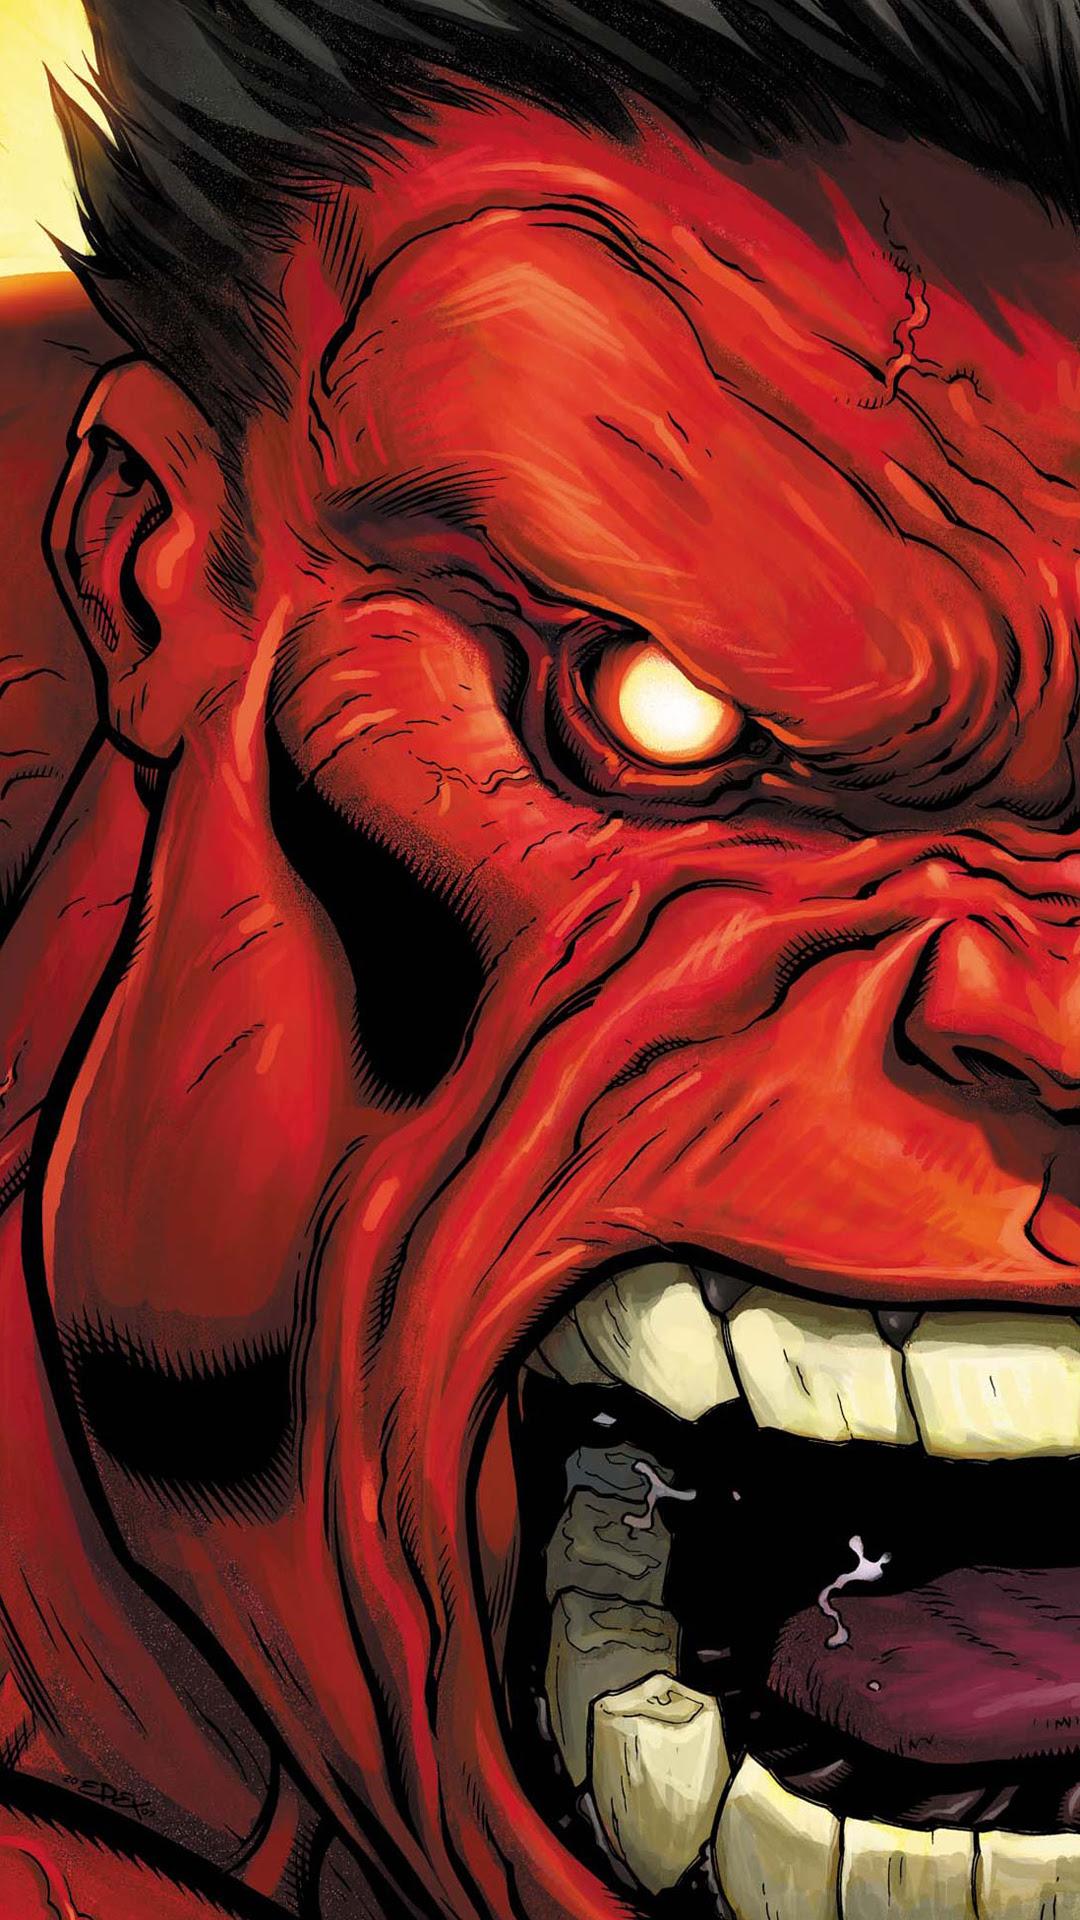 Hulk red face HTC hd wallpaper - Best htc one wallpapers